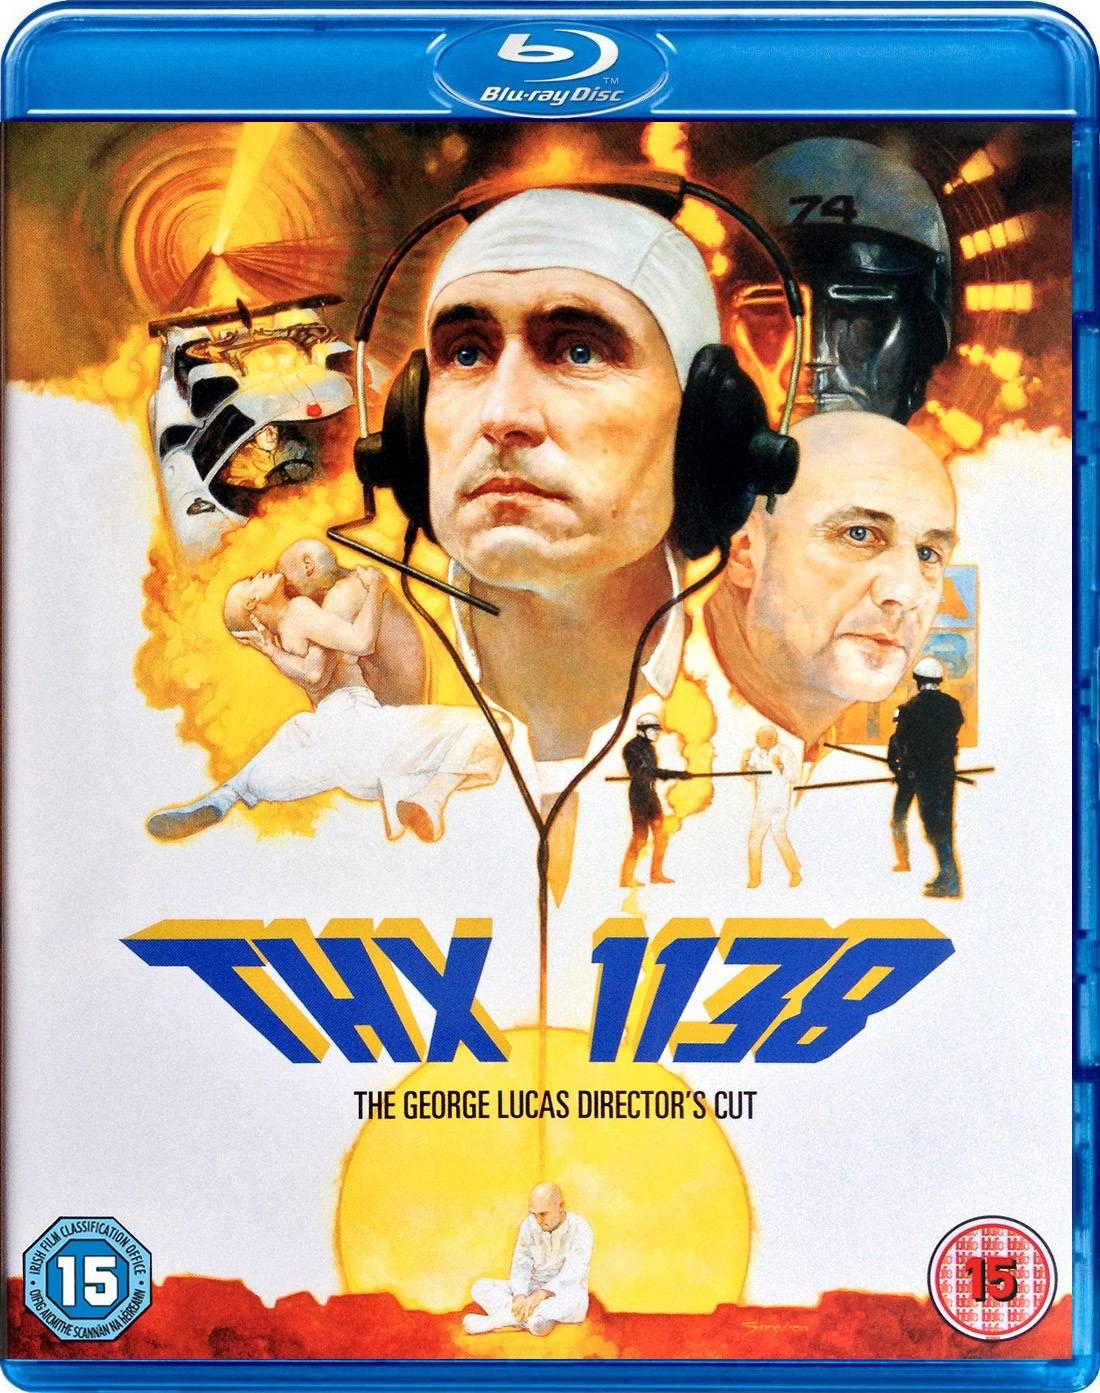 THX 1138 (1971) [Director's Cut]